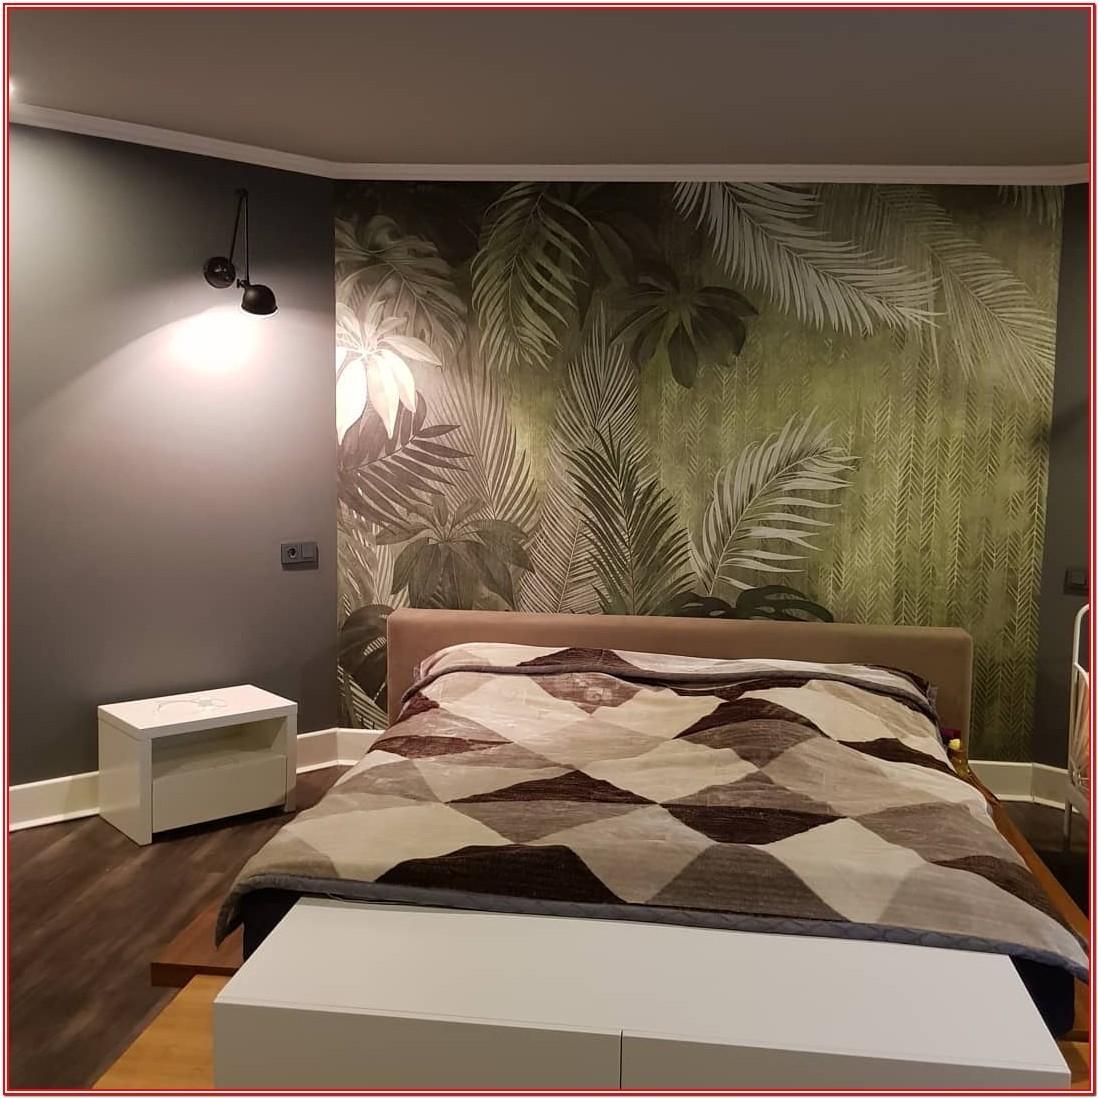 Living Room Wallpaper Trends 2020